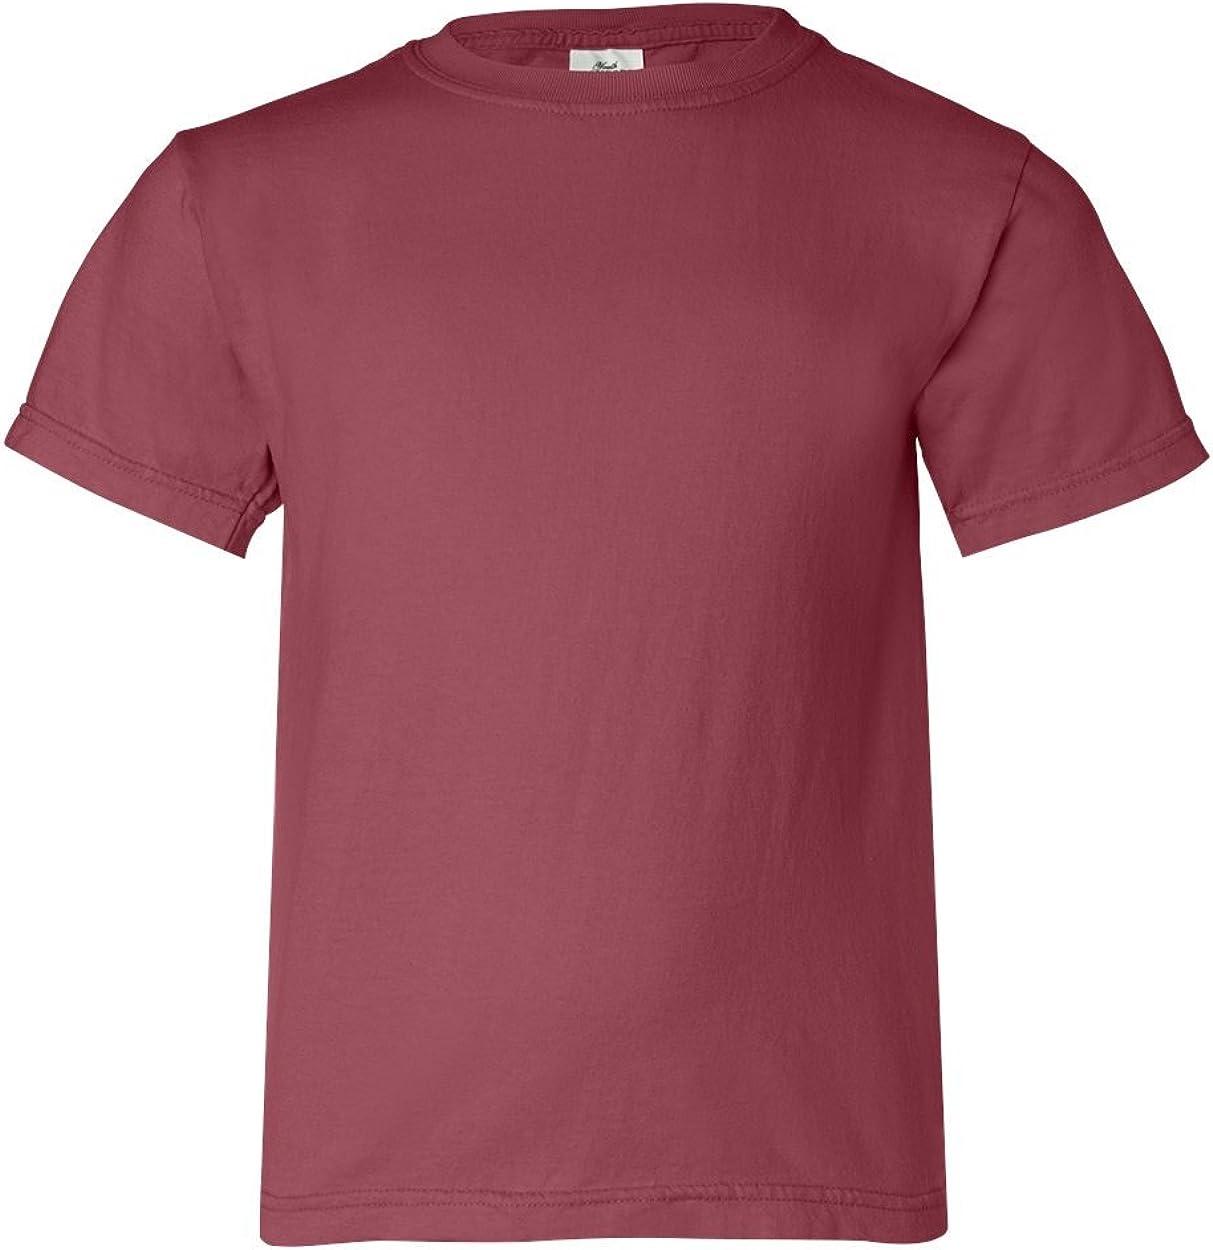 B0012OFKBW Comfort Colors 9018 - Youth Garment Dyed Ringspun T-Shirt 61HRybdI35L